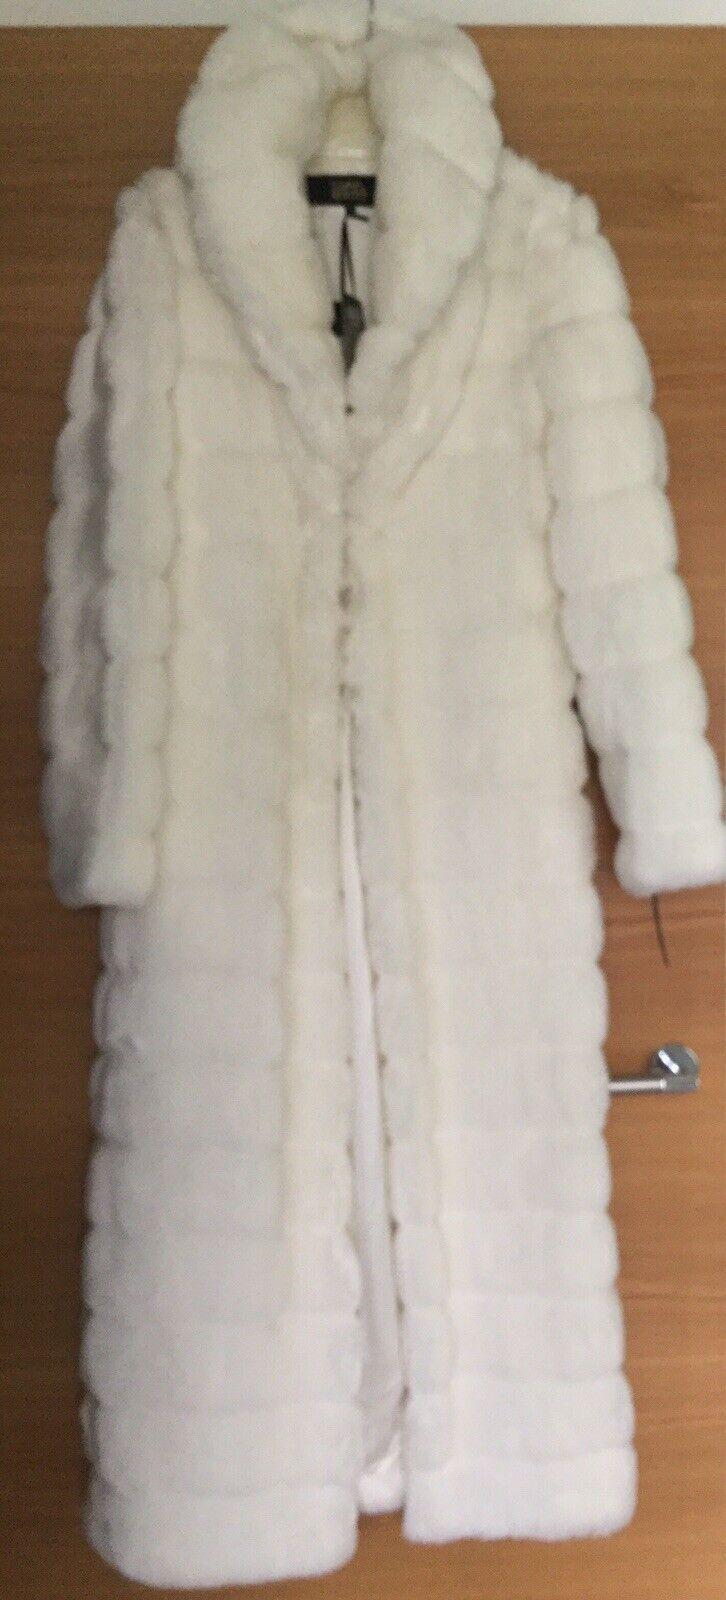 Stunning Cream Ivory Faux Fur Coat Size 8 Ladies Coat – Size 8 - Brand New